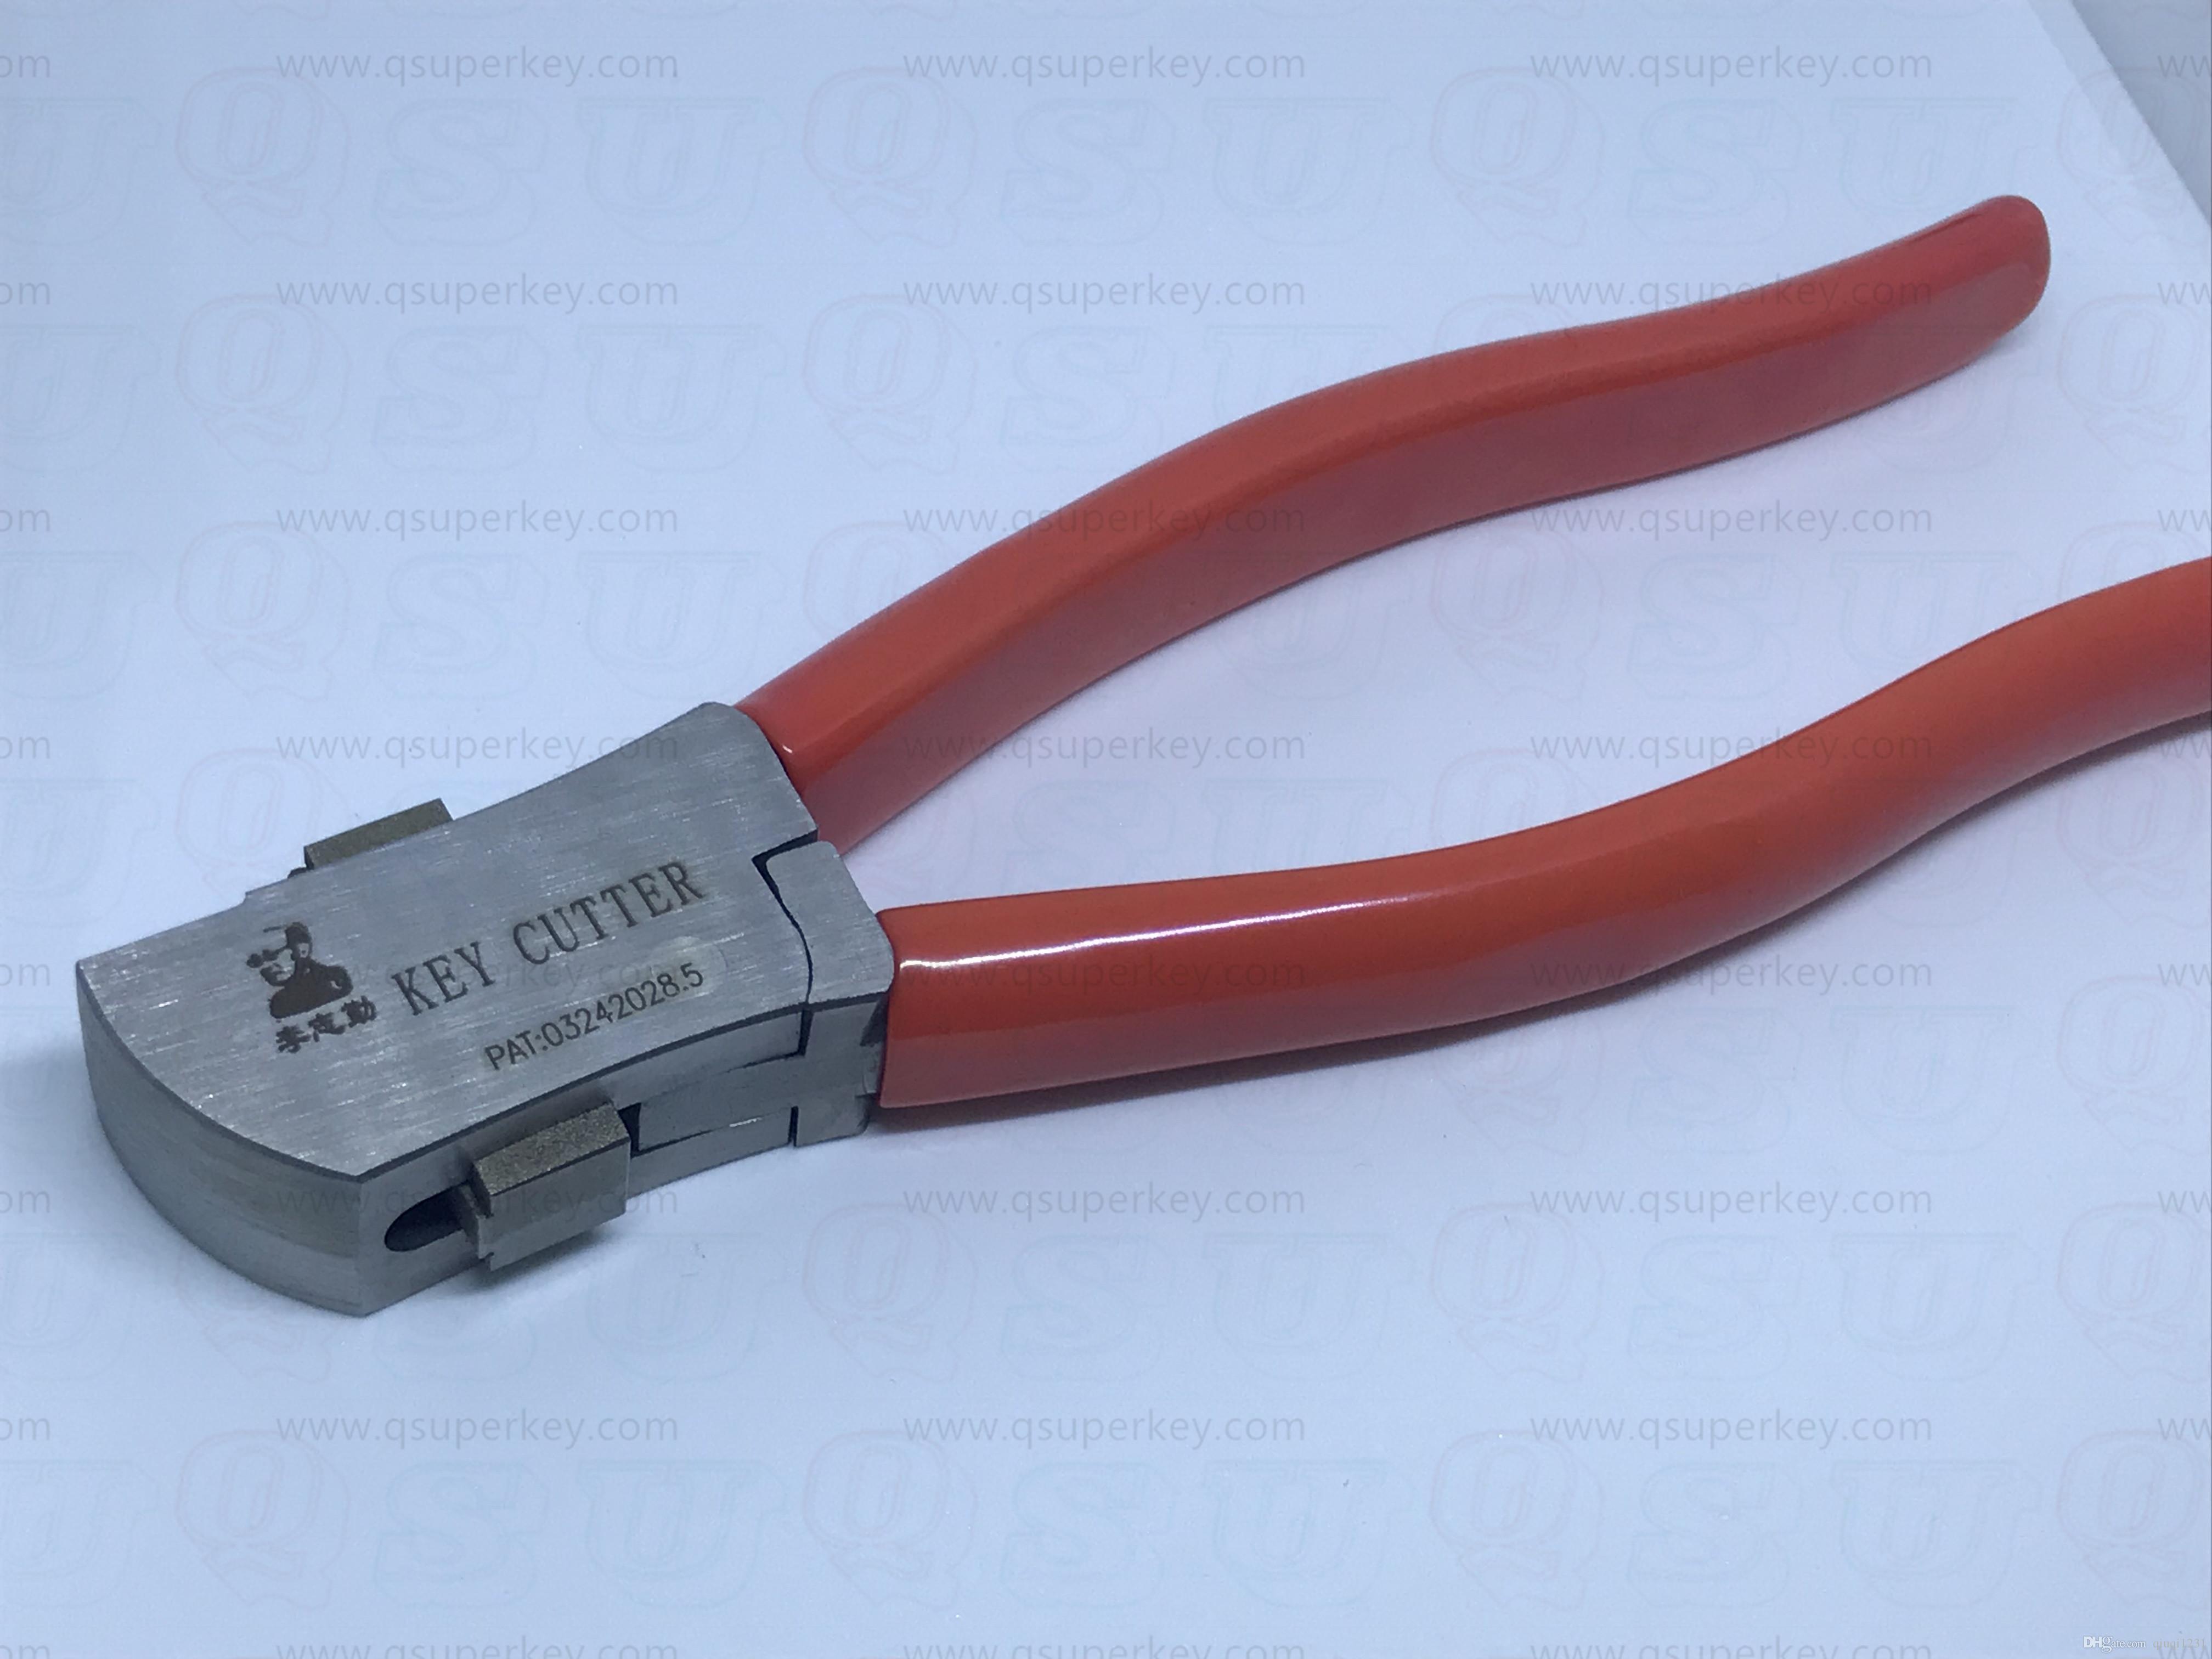 qsuperkey Hot Sale Lishi Key Cutter Auto Key Cutting Machine Lock Pick Set Locksmith Tools